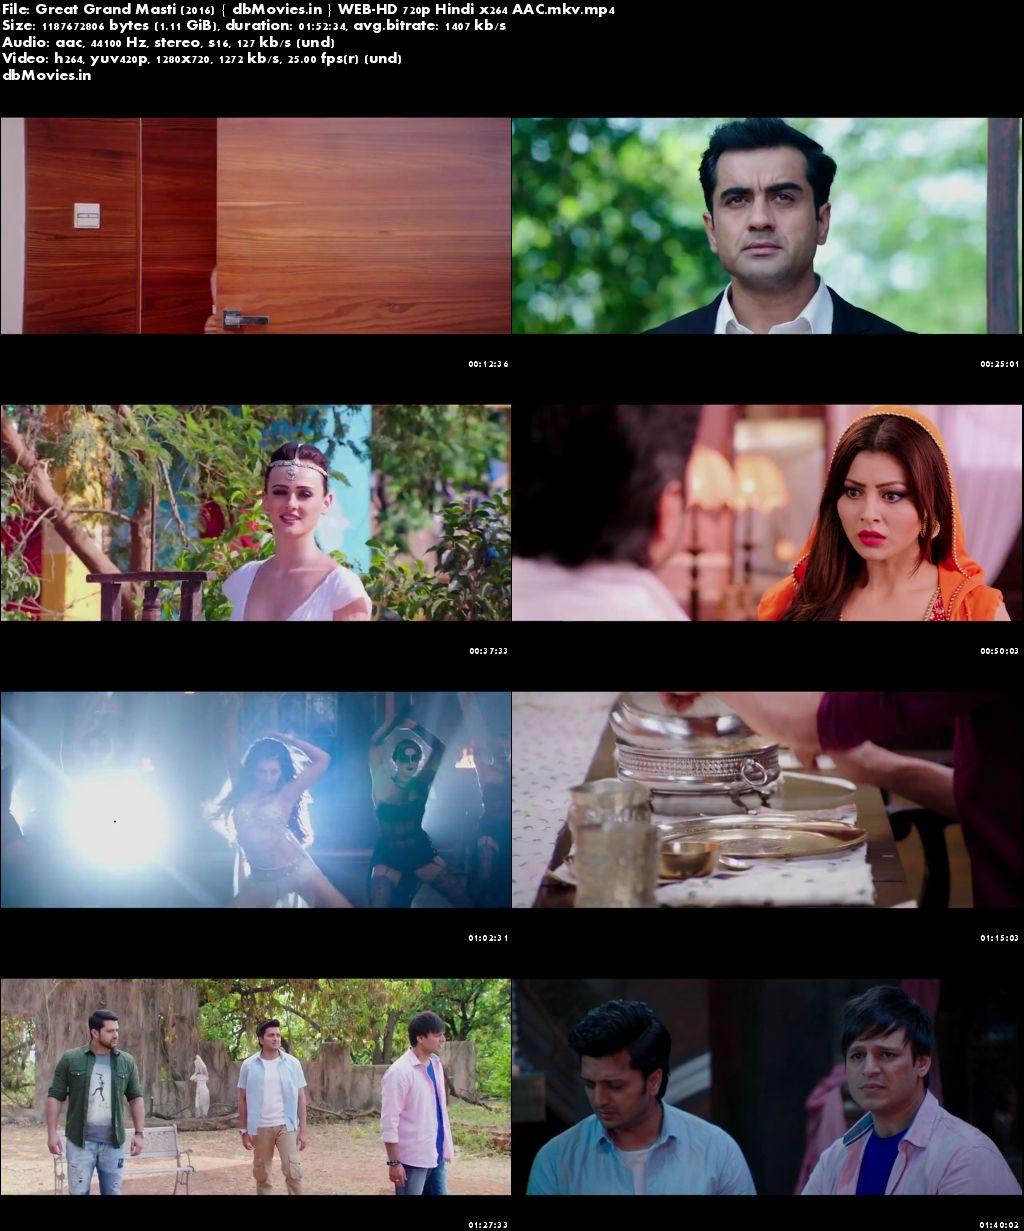 Screen Shots Great Grand Masti 2016 Full Movie Download HD 720p